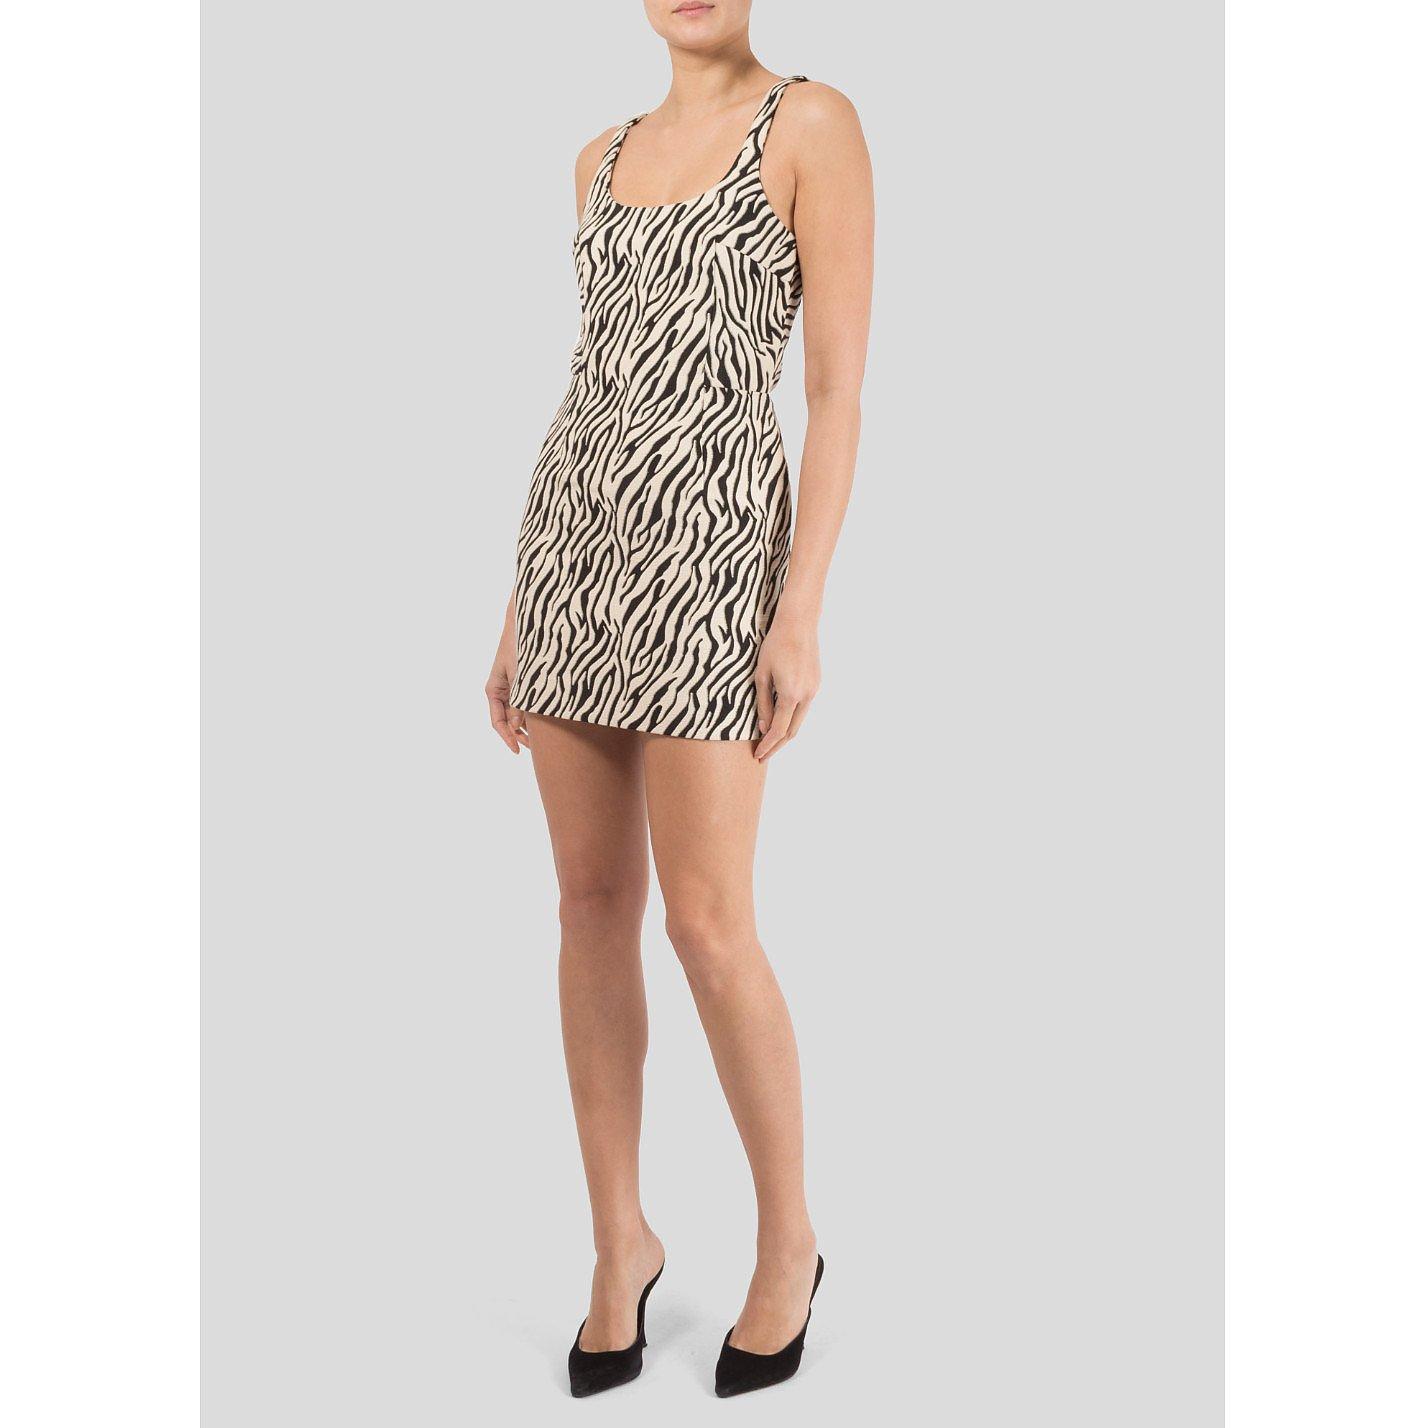 Bec + Bridge Cecile Mini Dress